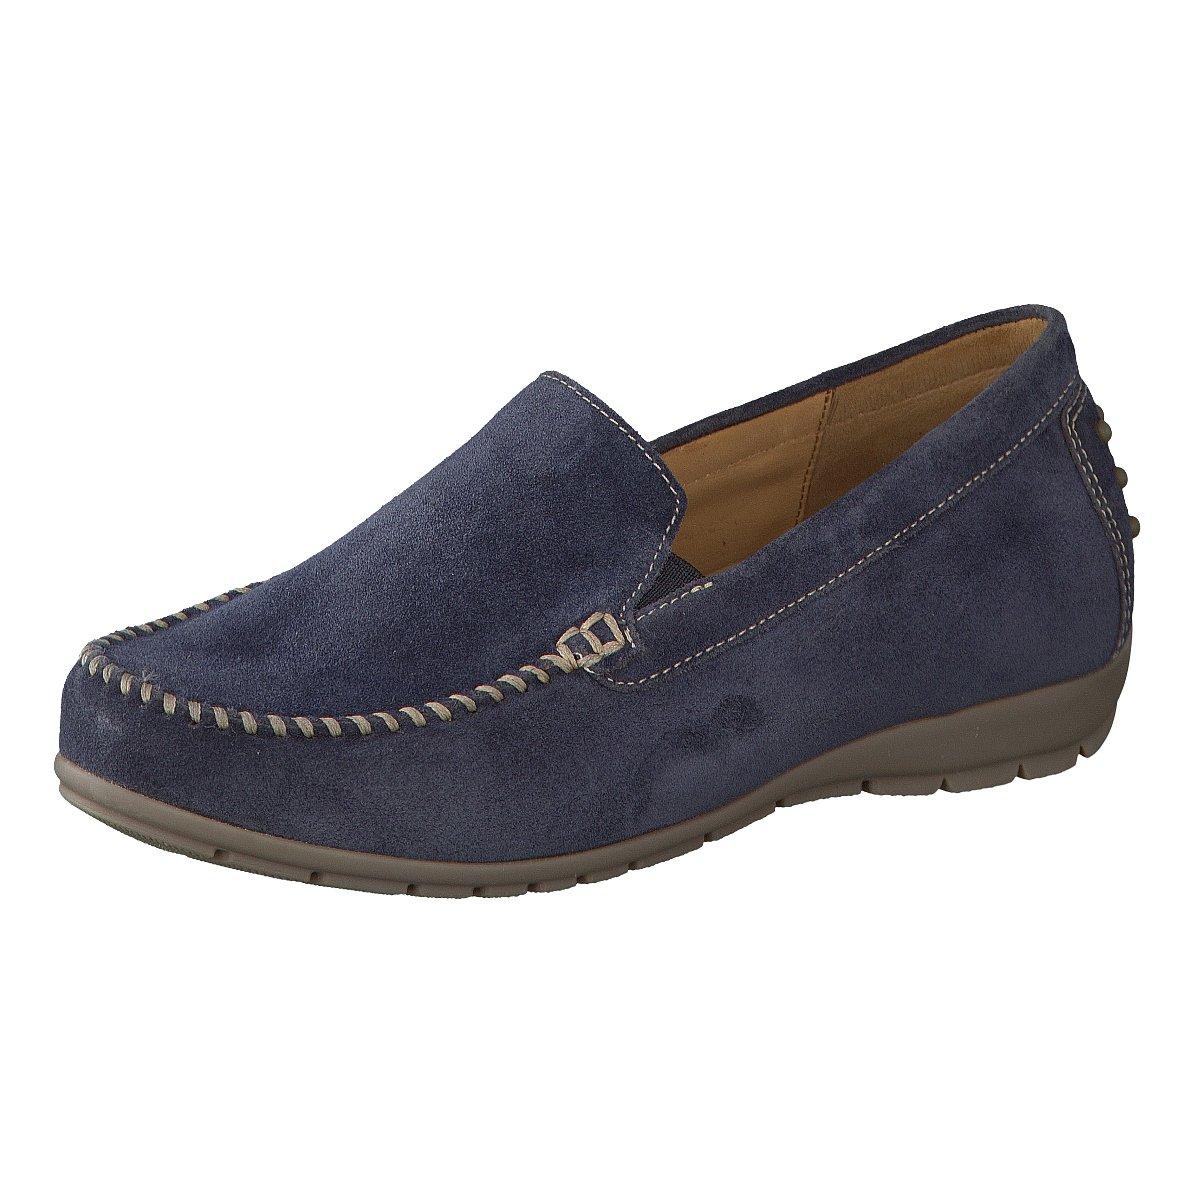 NEU Gabor comfort Damen Slipper Davos 62.660.46 blau 213749